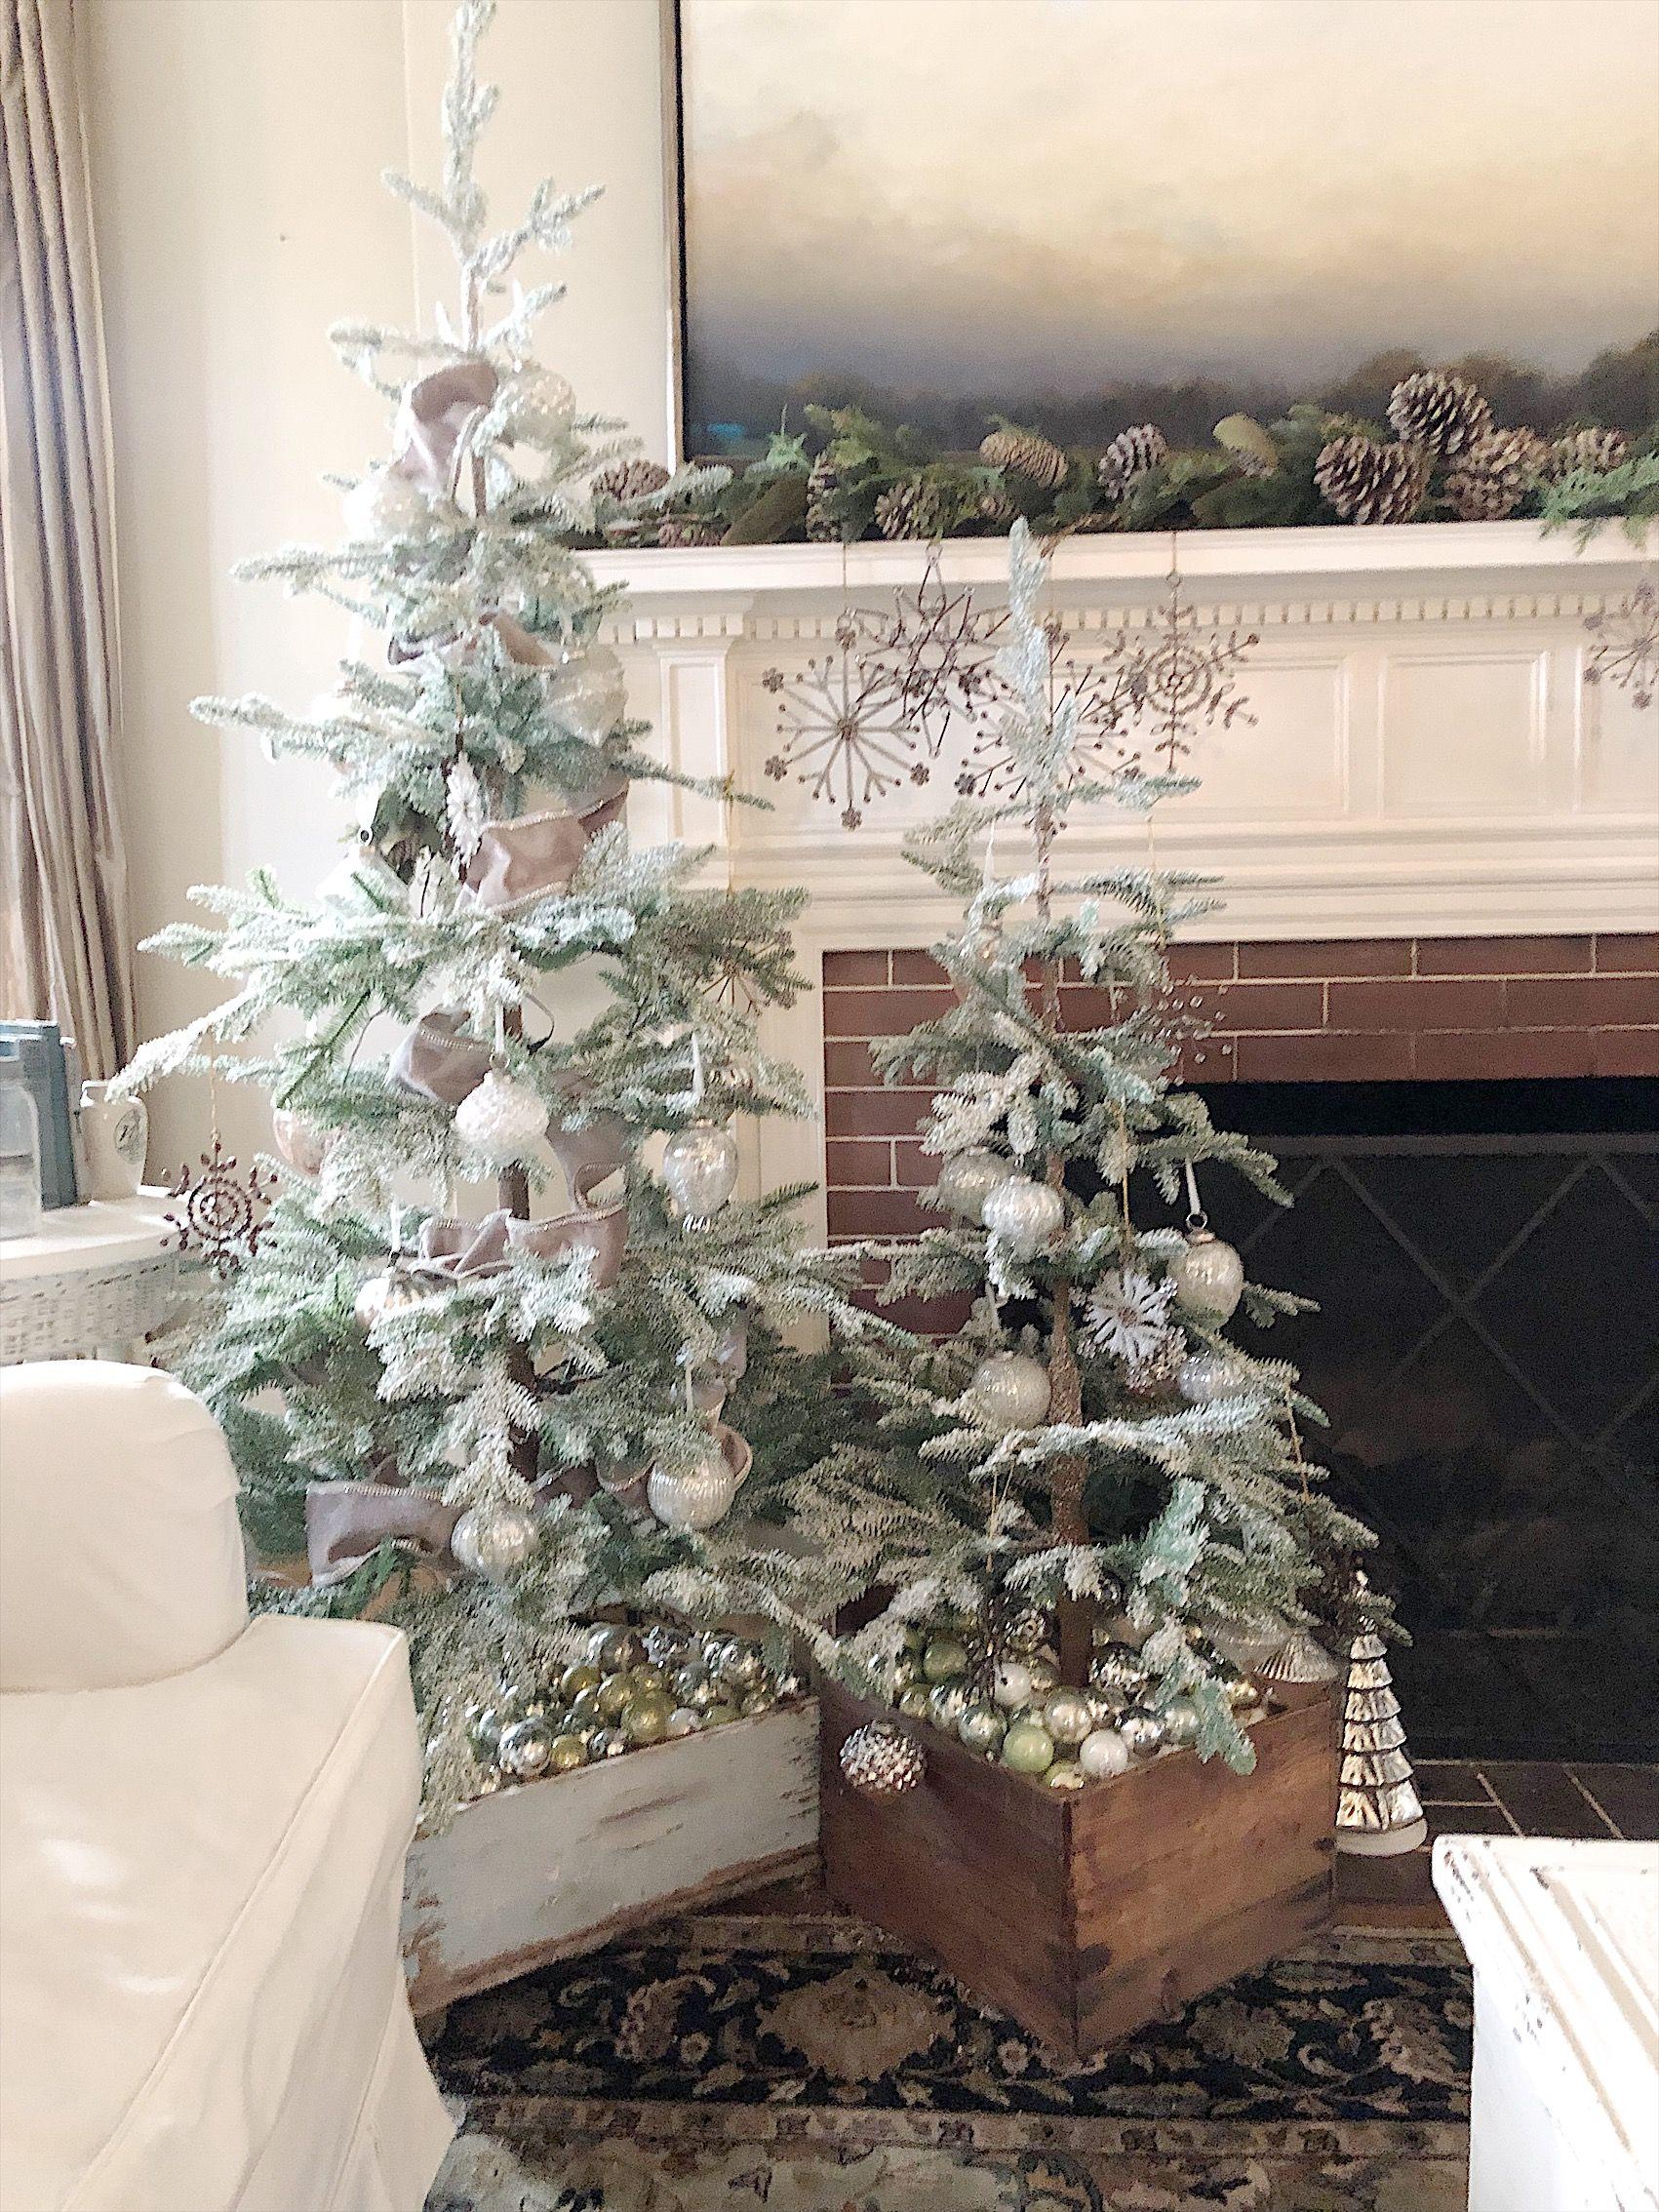 Christmas Tree Tour Holiday Decor Christmas Tree In Urn Christmas Centerpieces Diy